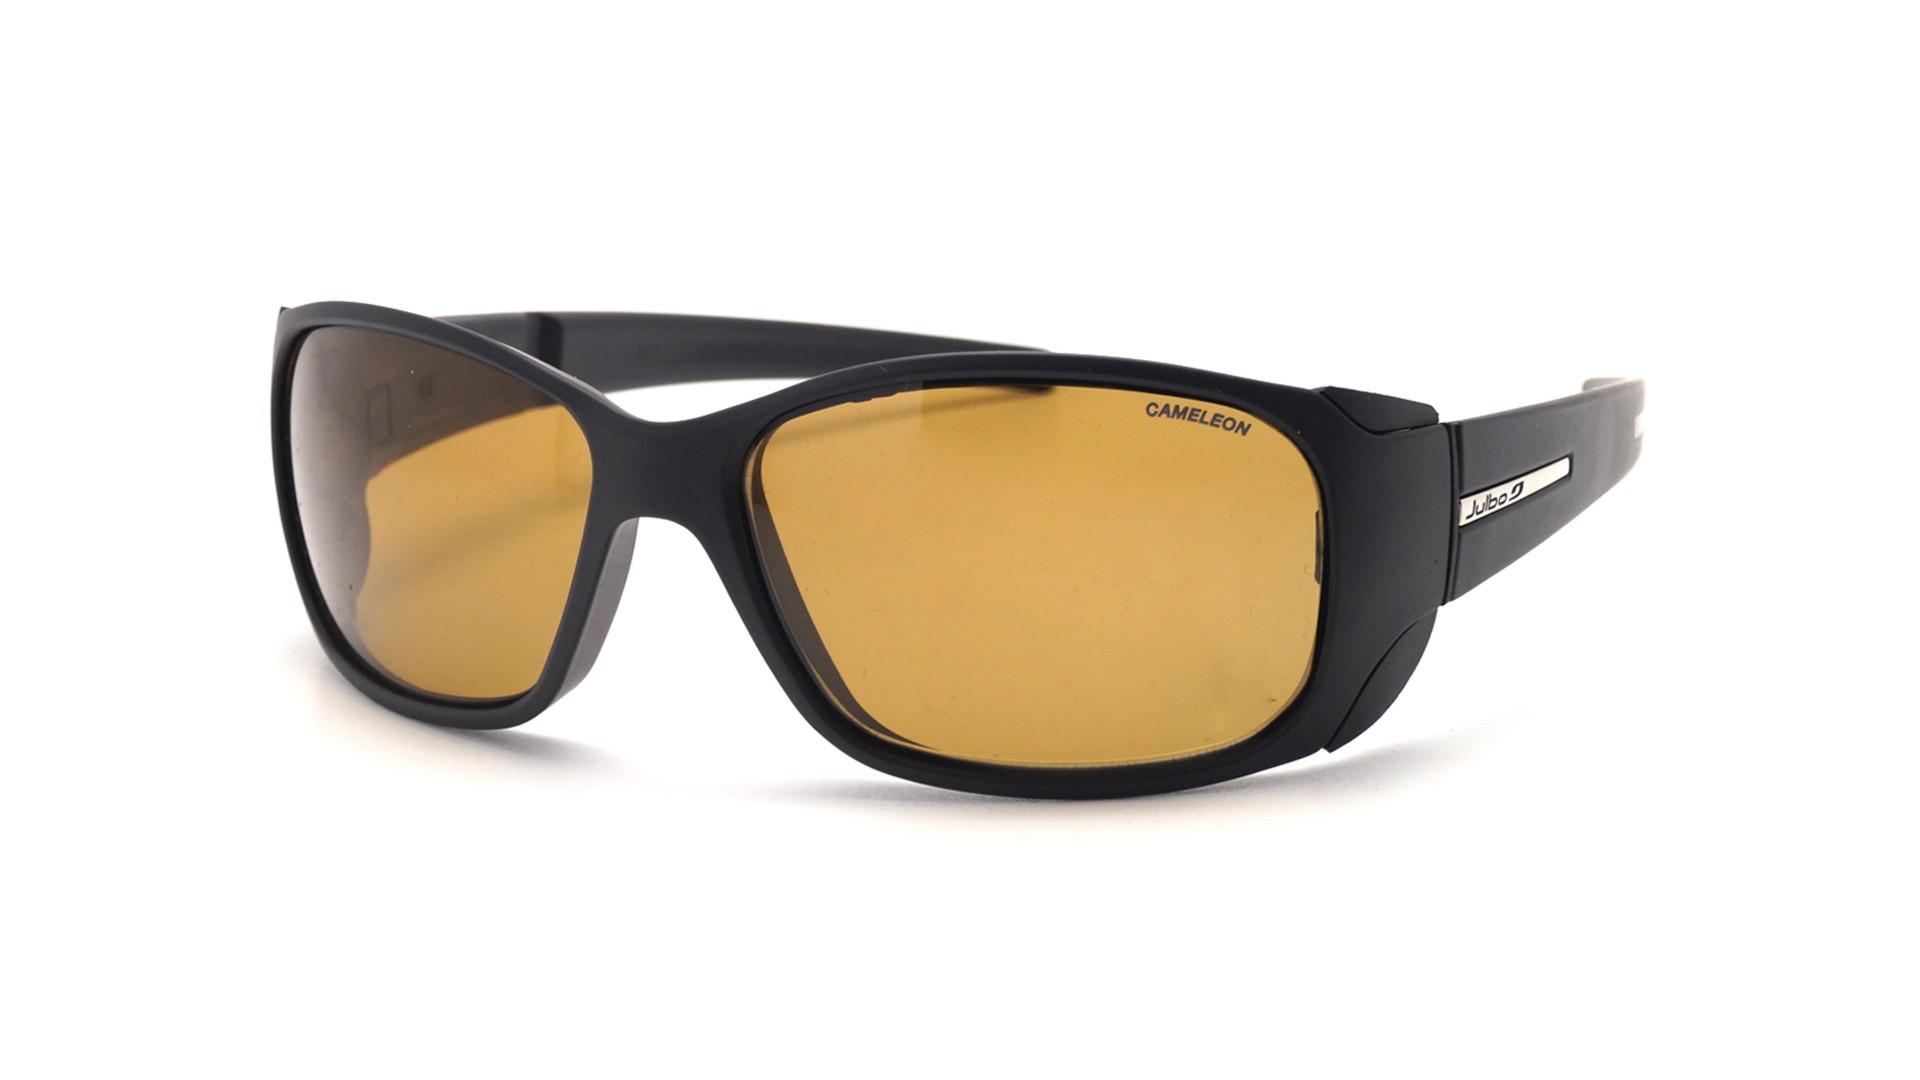 0f911c80827 Sunglasses Julbo Monterosa Black Matte J401 5014 58-15 Medium Polarized  Photochromic